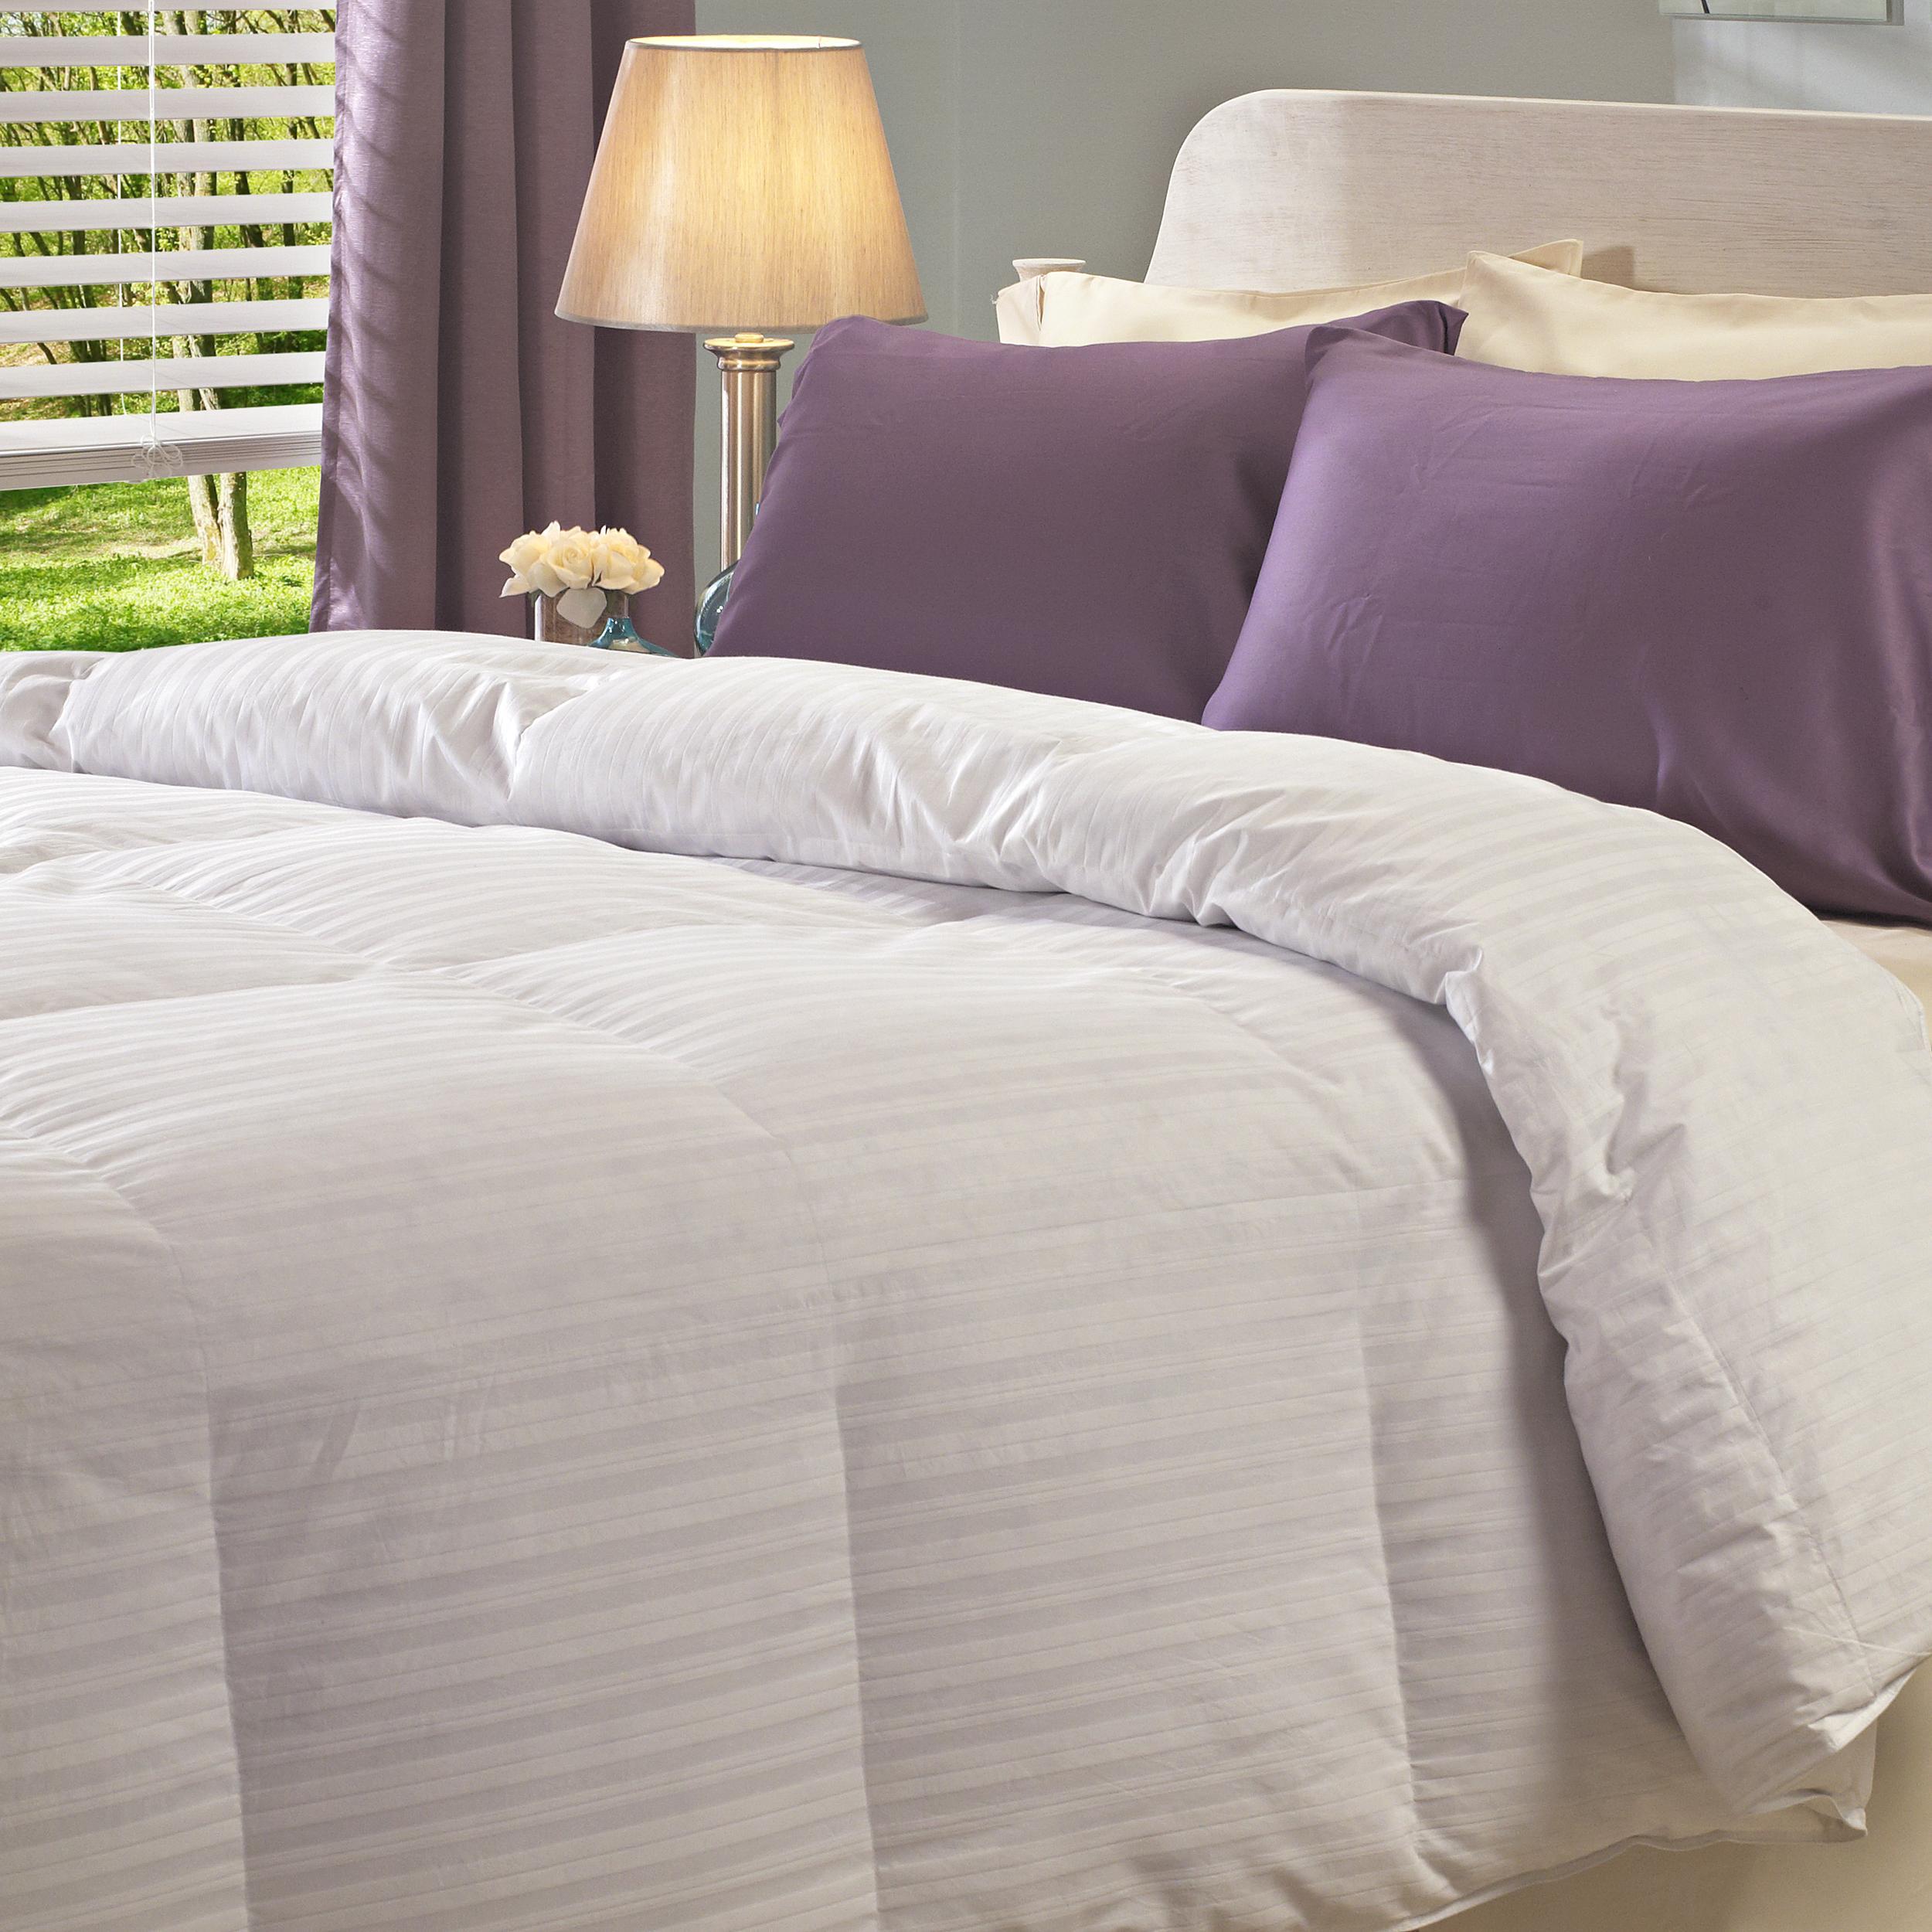 Oversized King Comforter 120x120 Brown Paisley Sheet Set